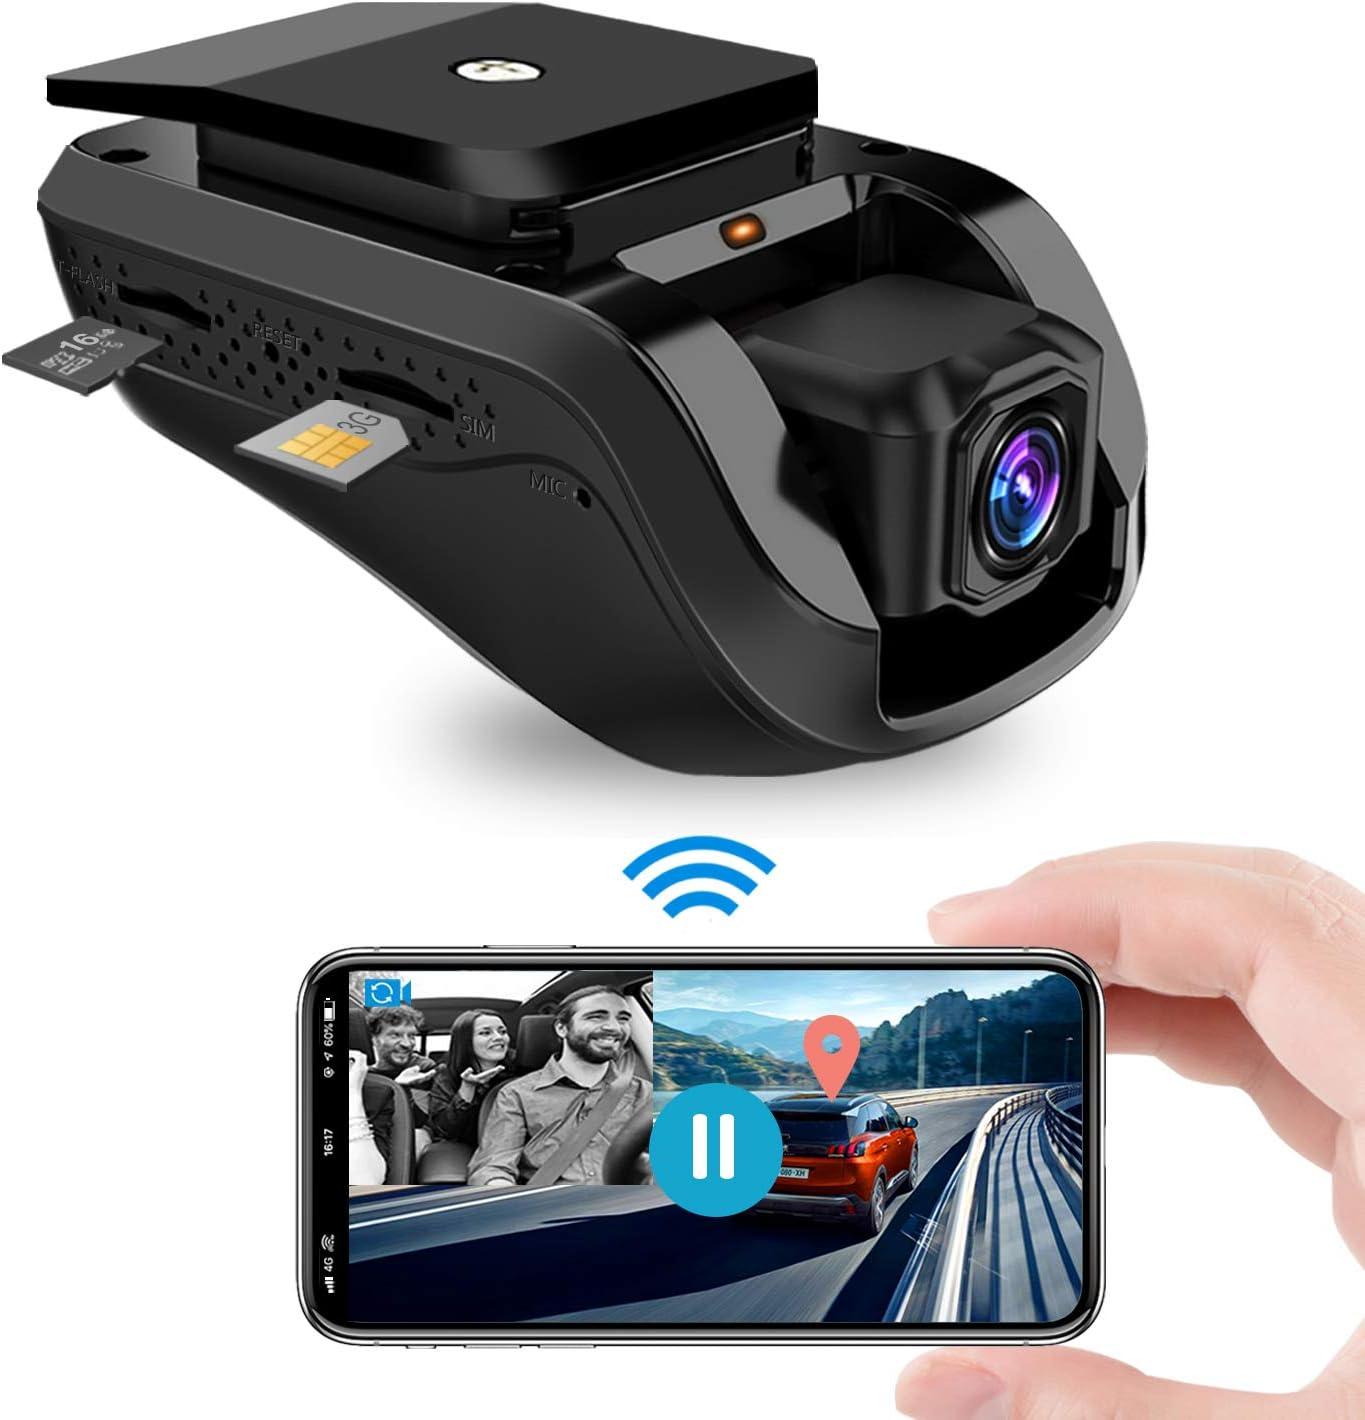 Dashcam, Jimi 3G Video Remoto WiFi Dual Dash Cámara de Coche Conducir Grabadora Frente 1080P con GPS Incorporado, Grabación en Bucle, Sensor G, Visión Nocturna - Tarjeta de 16GB TF Gratis